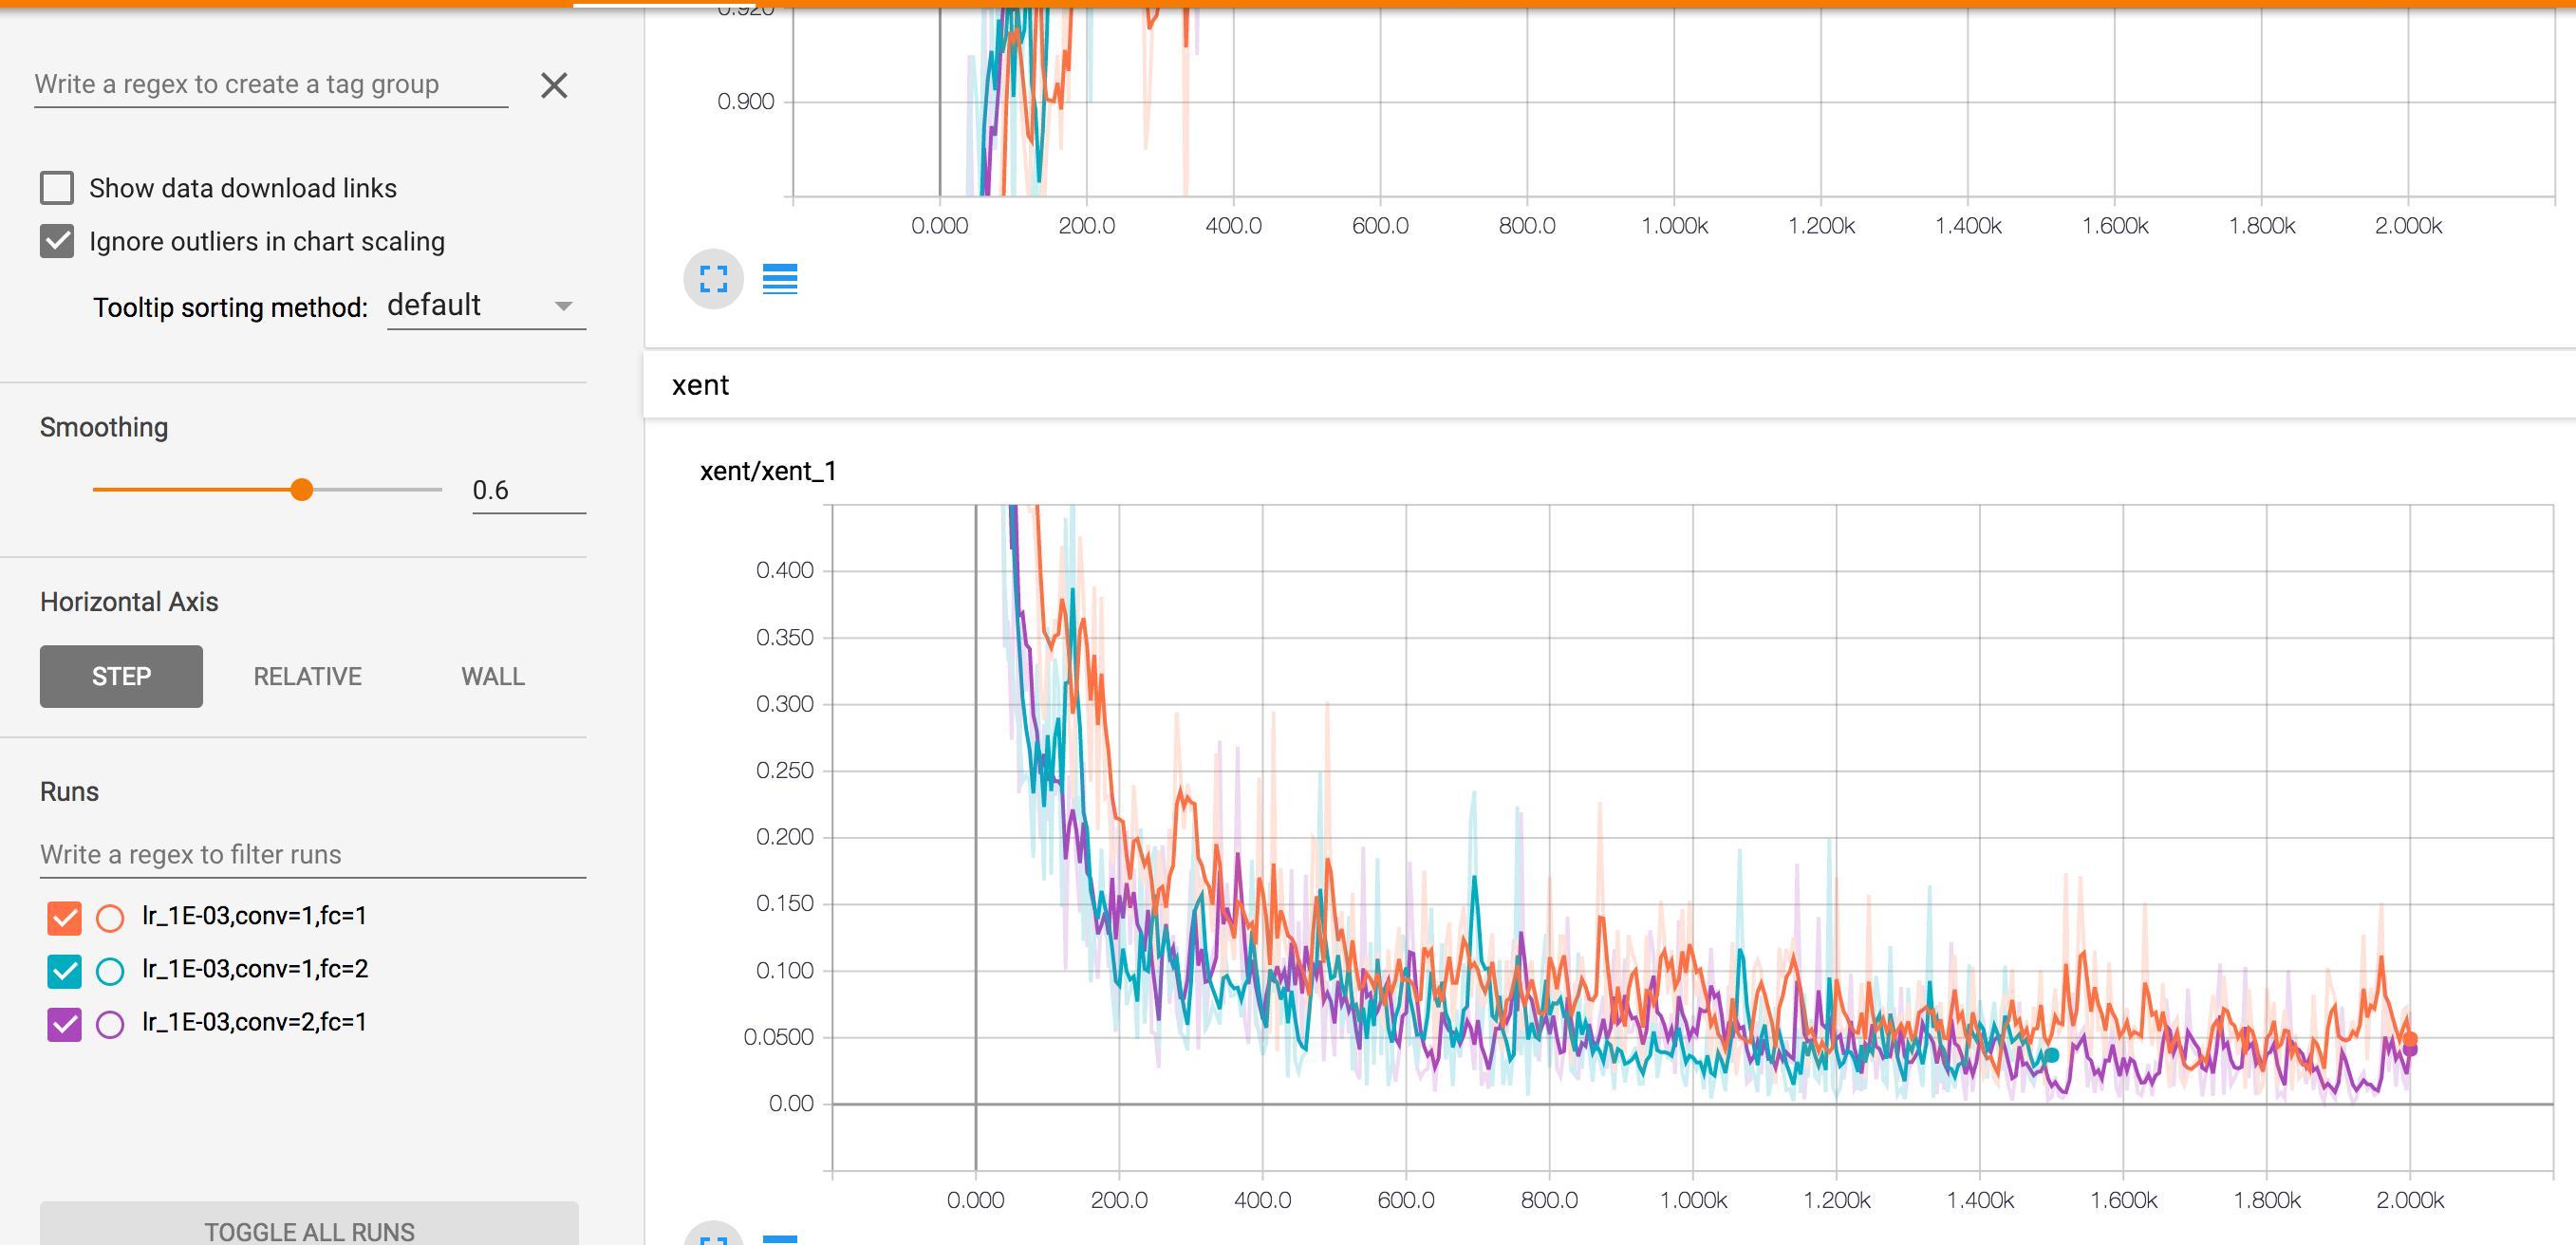 work] tensorboard visualization - Programmer Sought